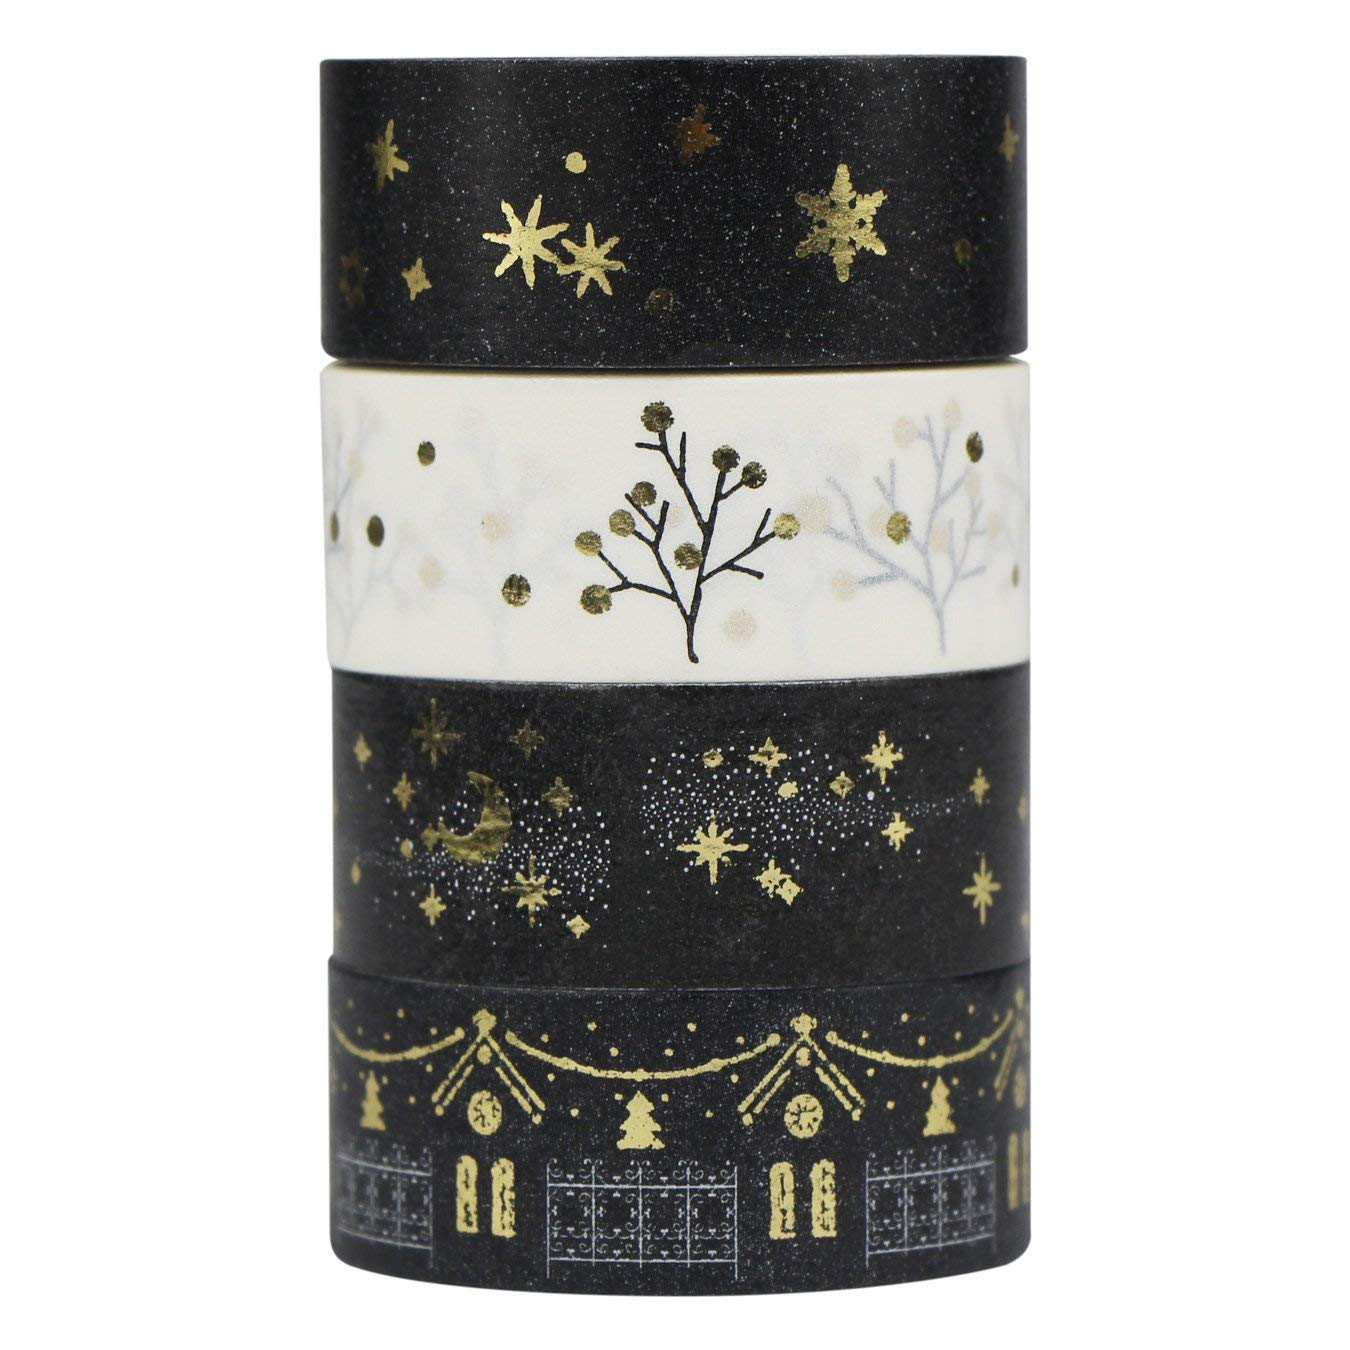 Nastro decorativo Washi AUFODARA Set di 4 pz argento